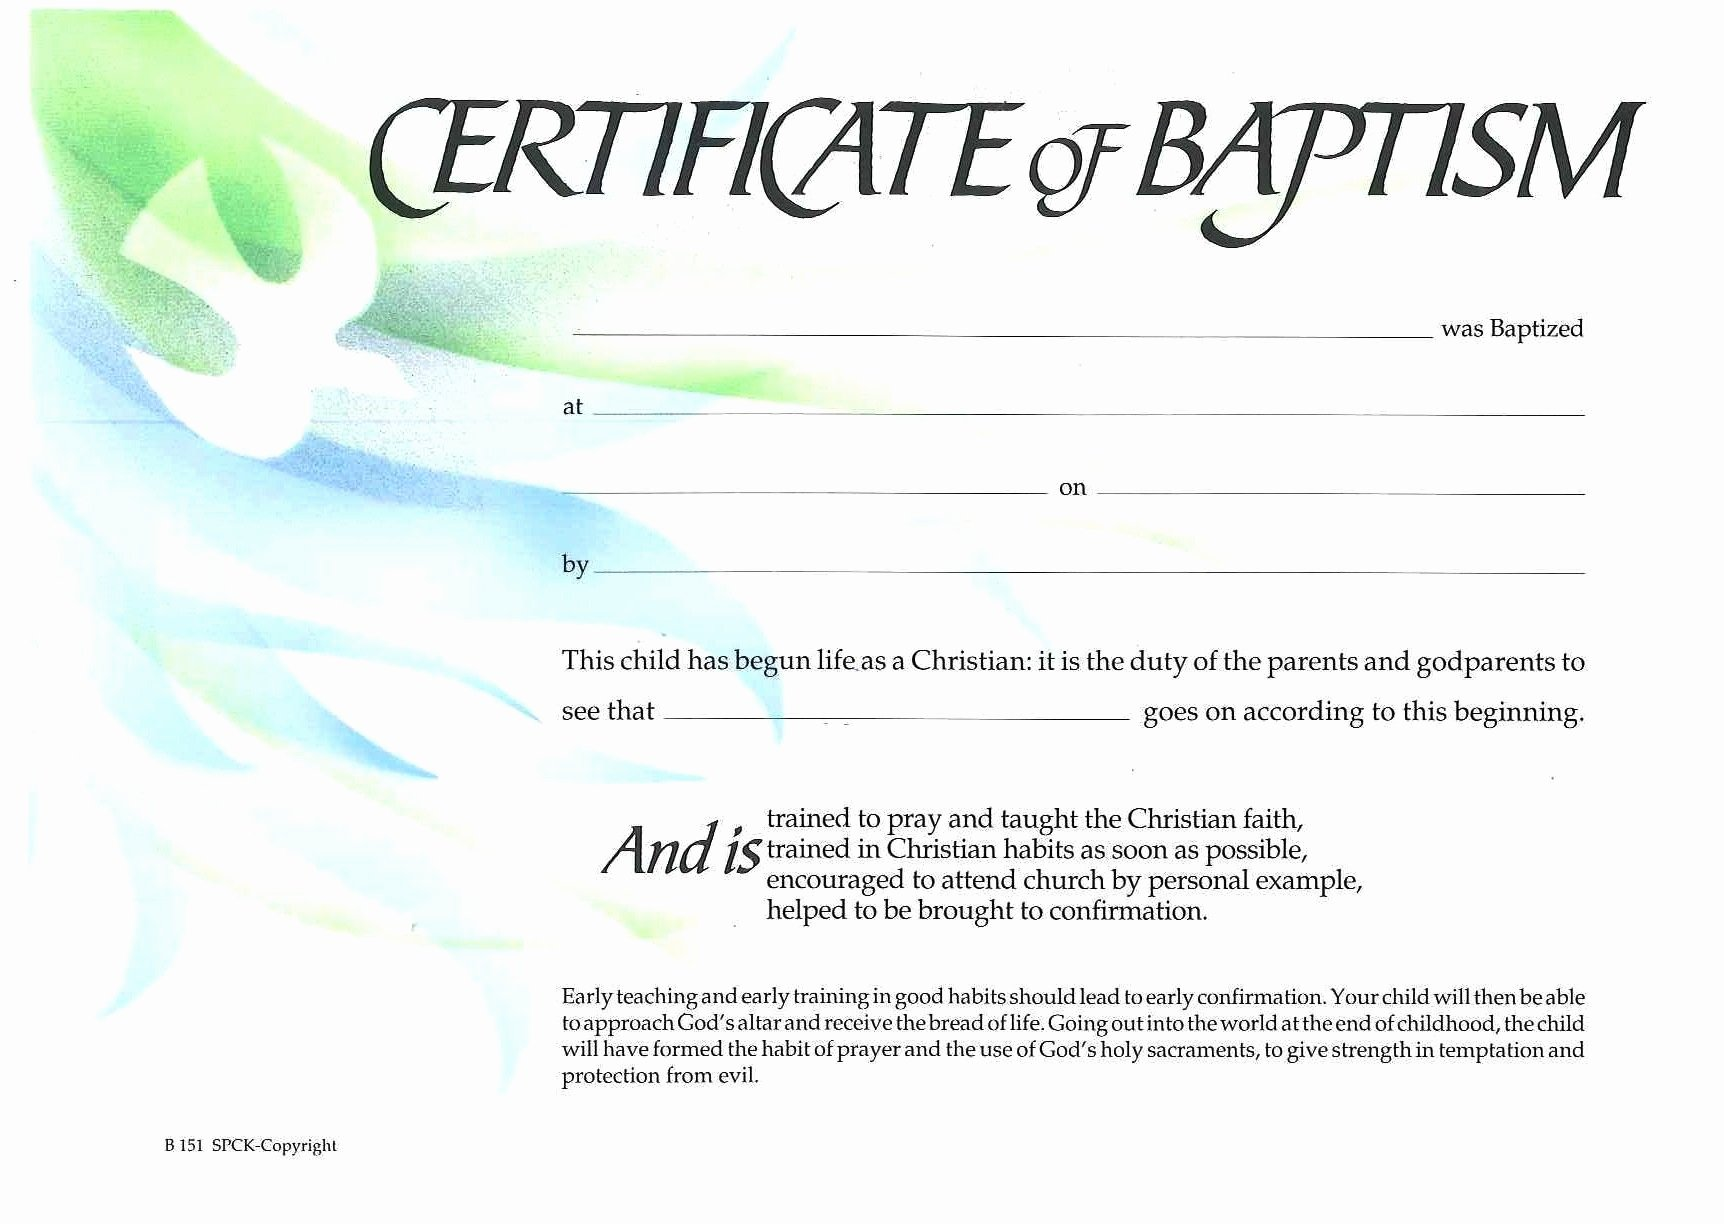 Certificate Of Baptism Template Fresh Baptism Certificate Xp4eamuz Sunday School